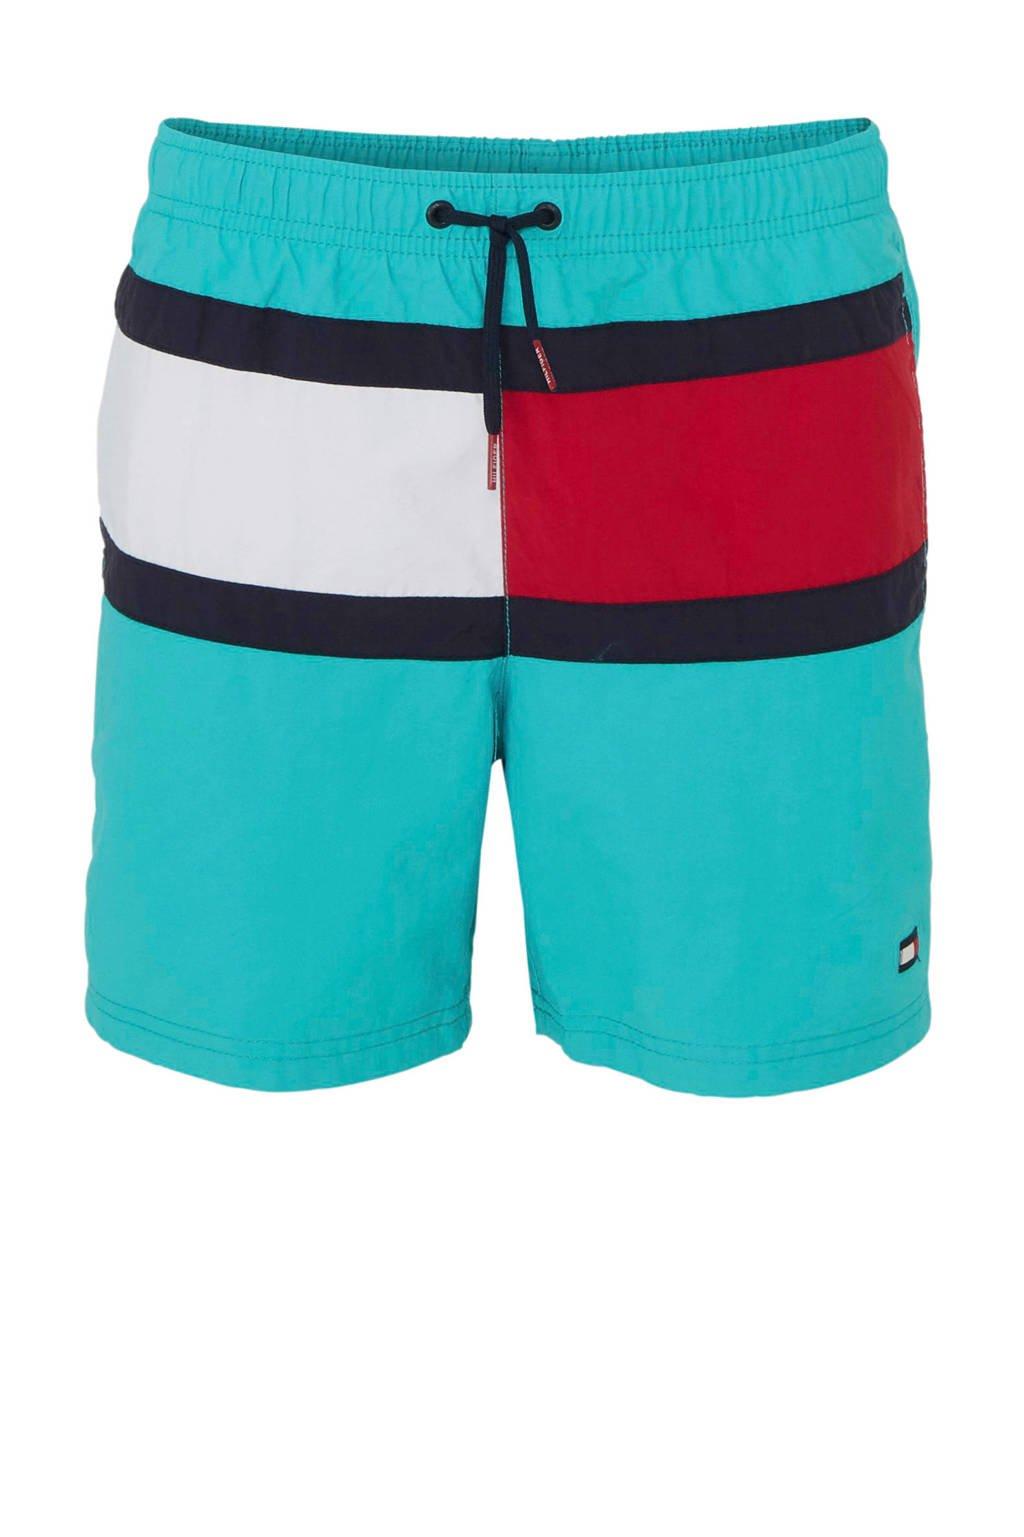 Tommy Hilfiger zwemshort met kleurvlakken turquoise, turquoise/rood/wit